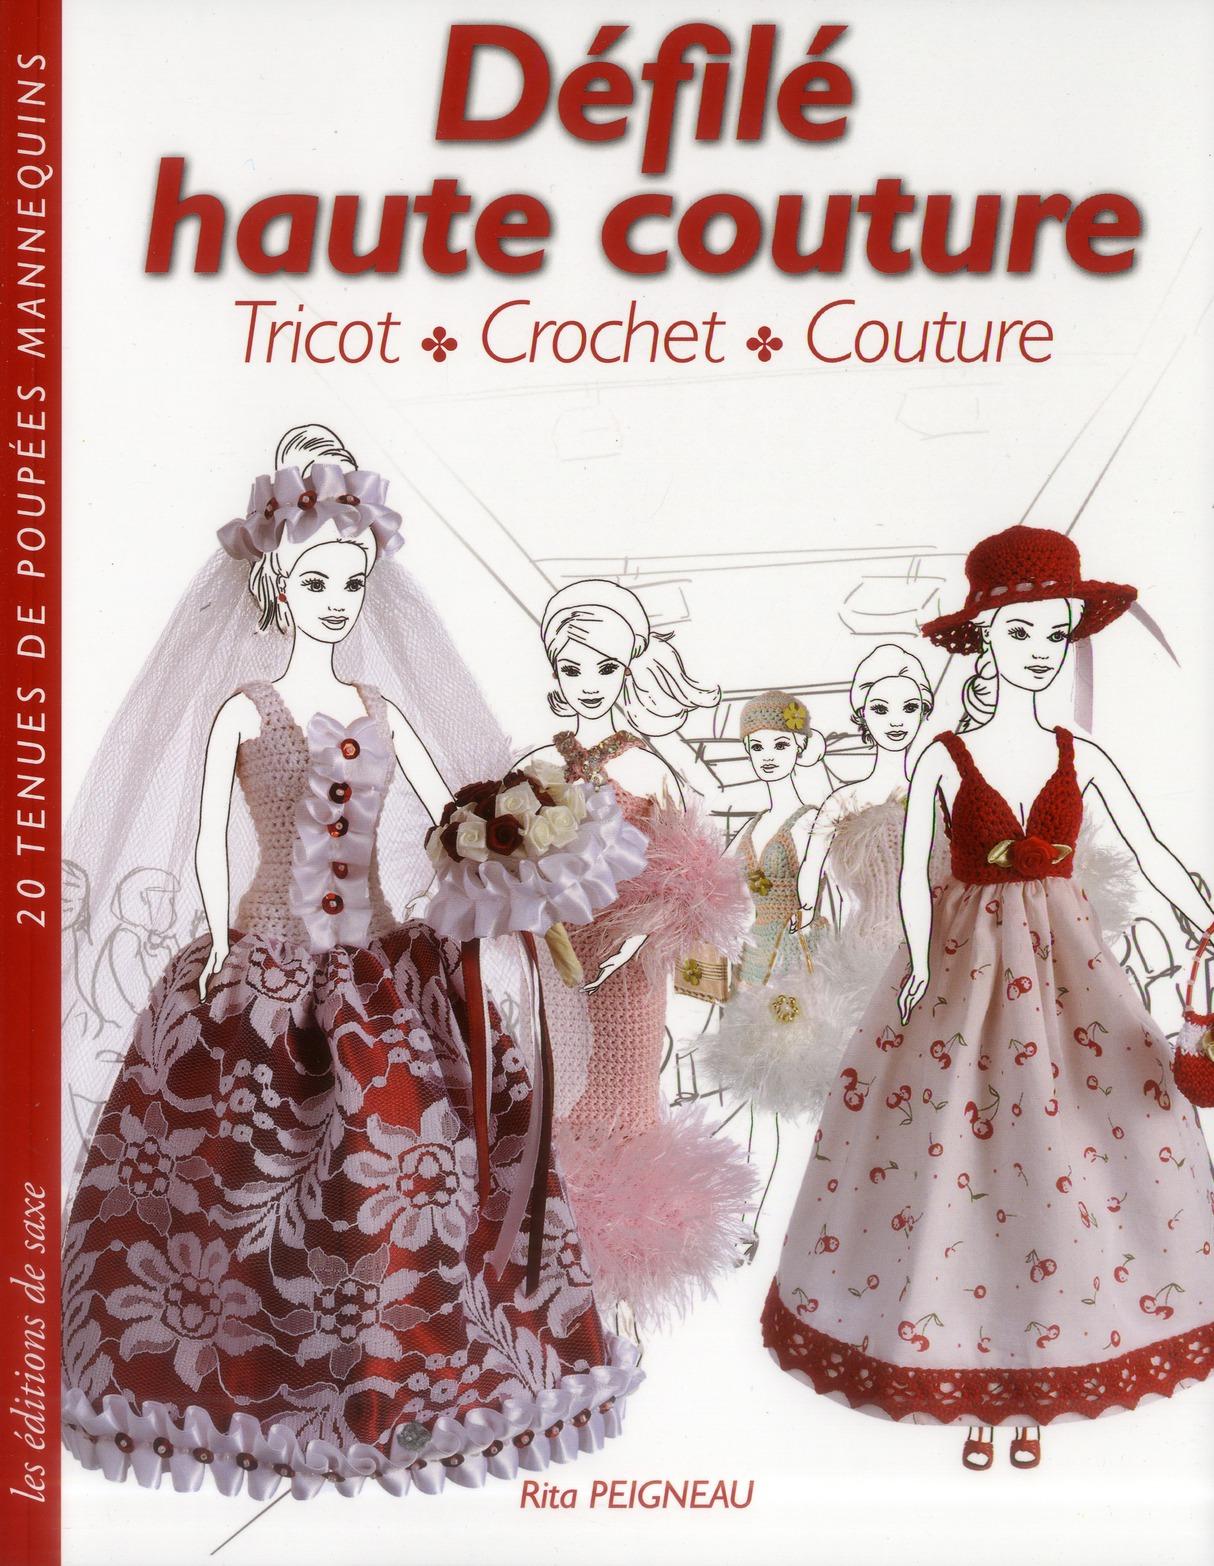 DEFILE HAUTE COUTURE - TRICOT - CROCHET - COUTURE. 20 TENUESDE POUPEES MANNEQUIN